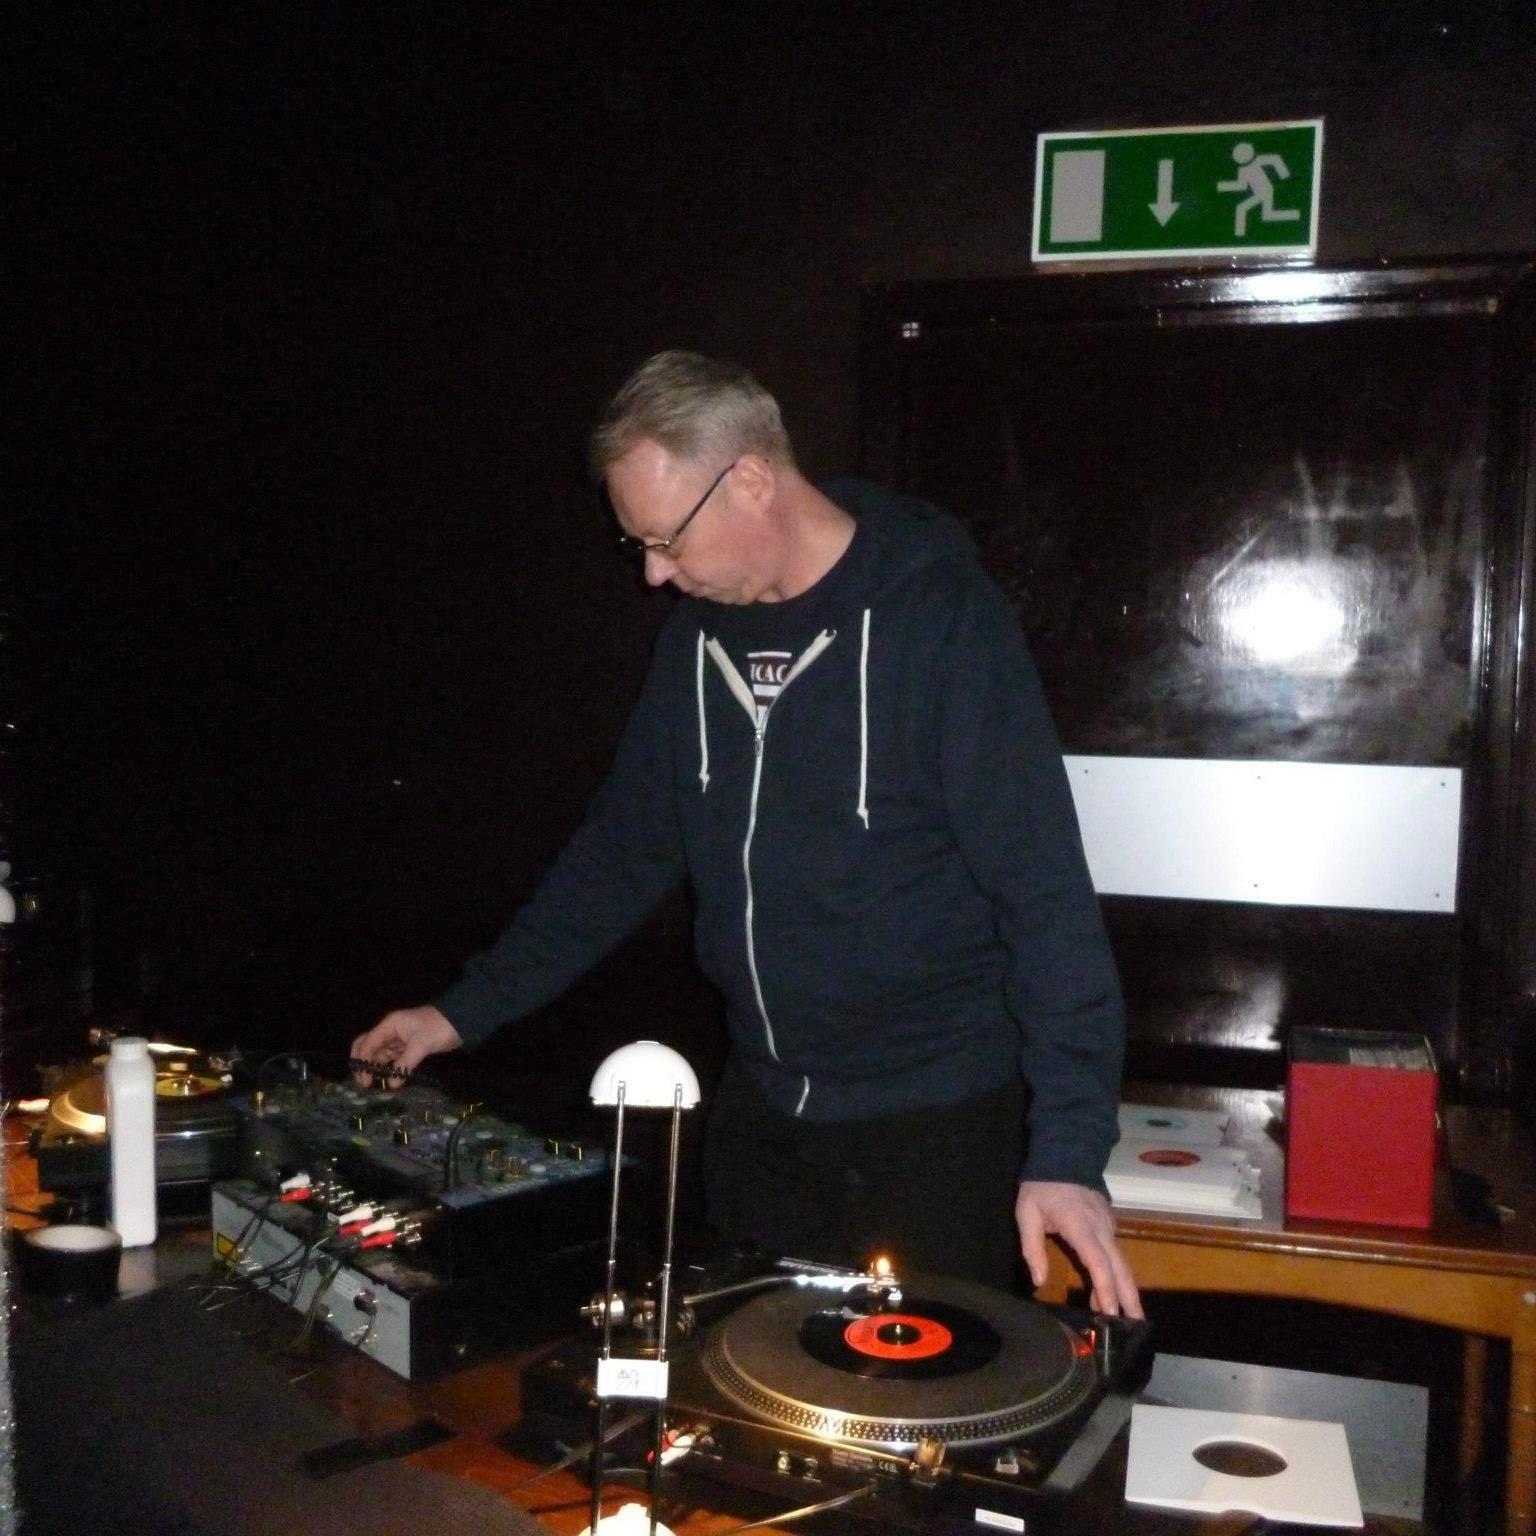 Steve Perkins source profile cover photo